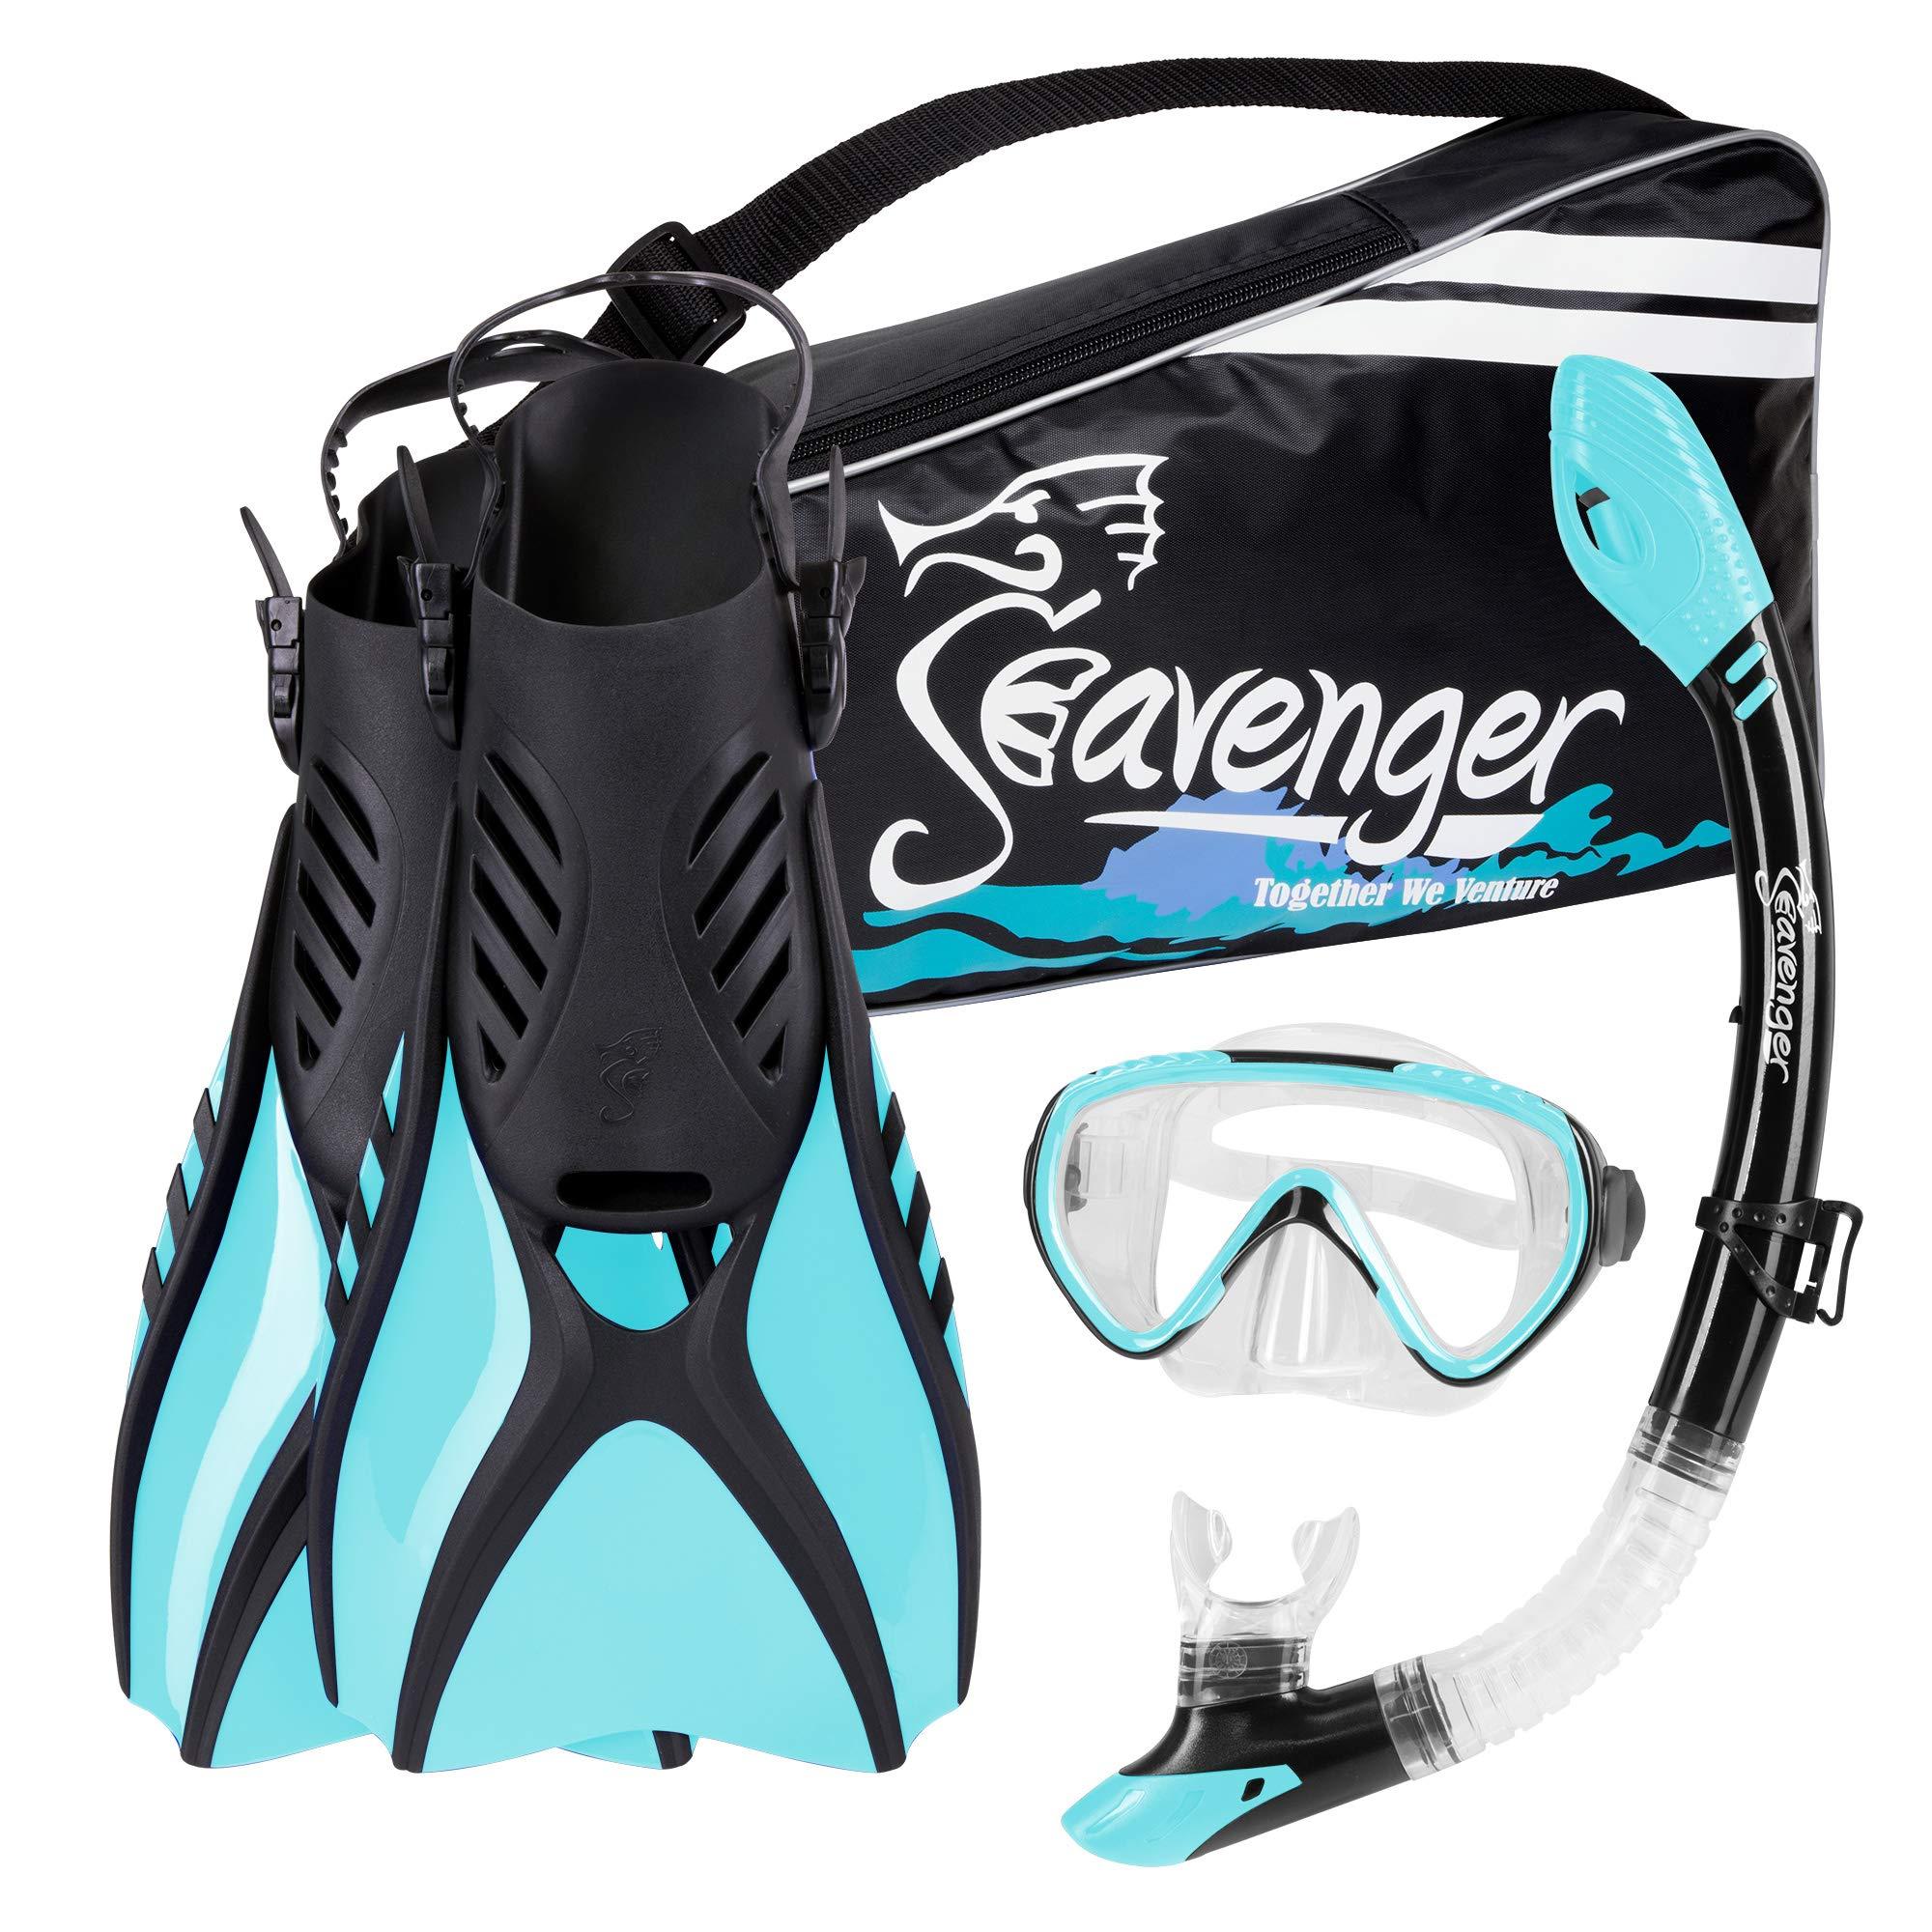 Seavenger Voyager Snorkeling Set | Travel Fins, Snorkel, Mask and Gear Bag for Men and Women (Sky Blue, Small) by Seavenger